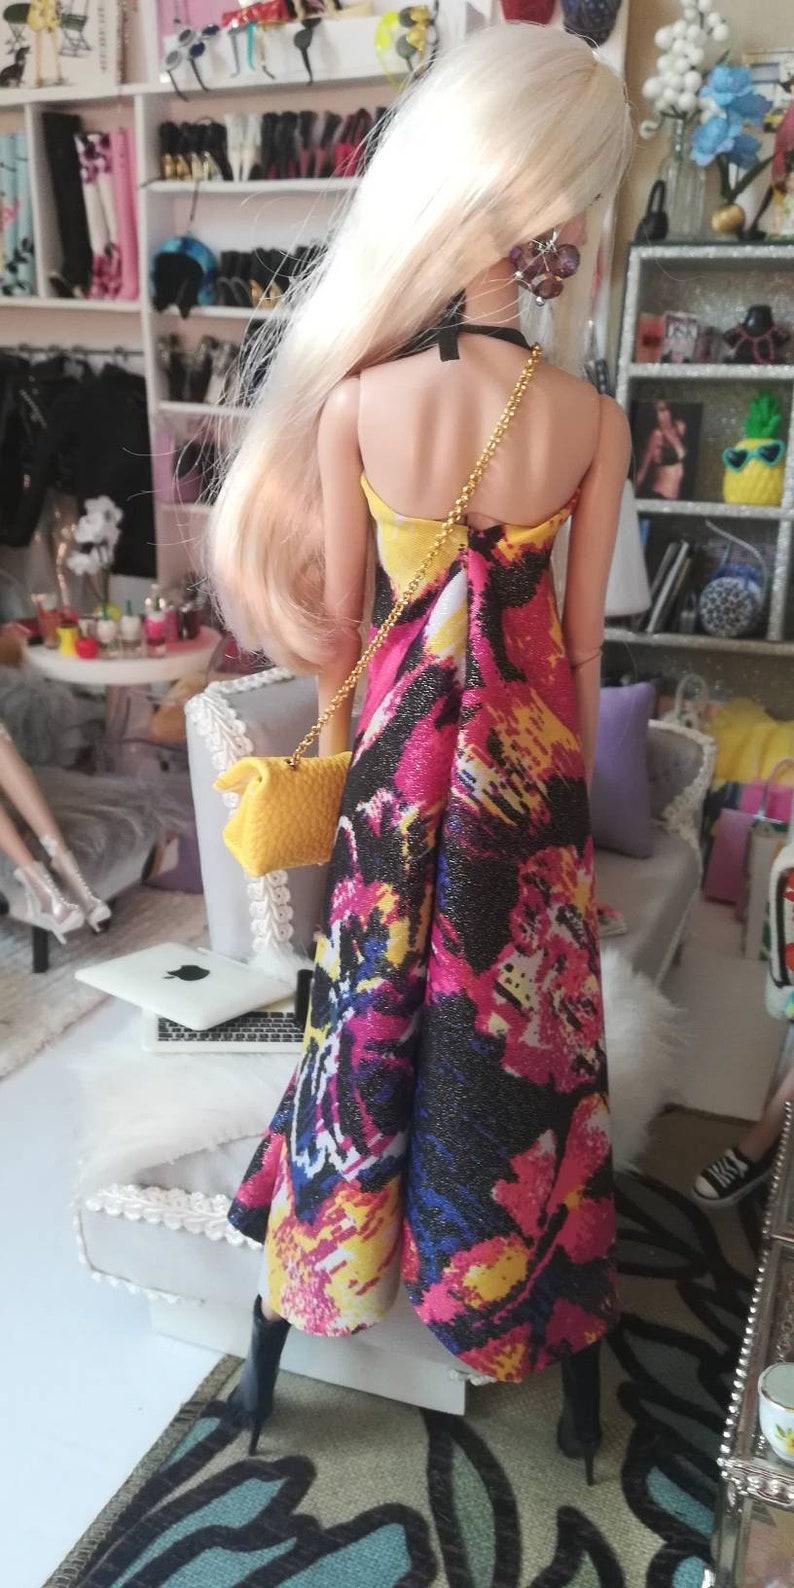 pullip All other same size doll vintage barbie momoko Fashion Royalty dress handmade to fit Barbie poppy Parker